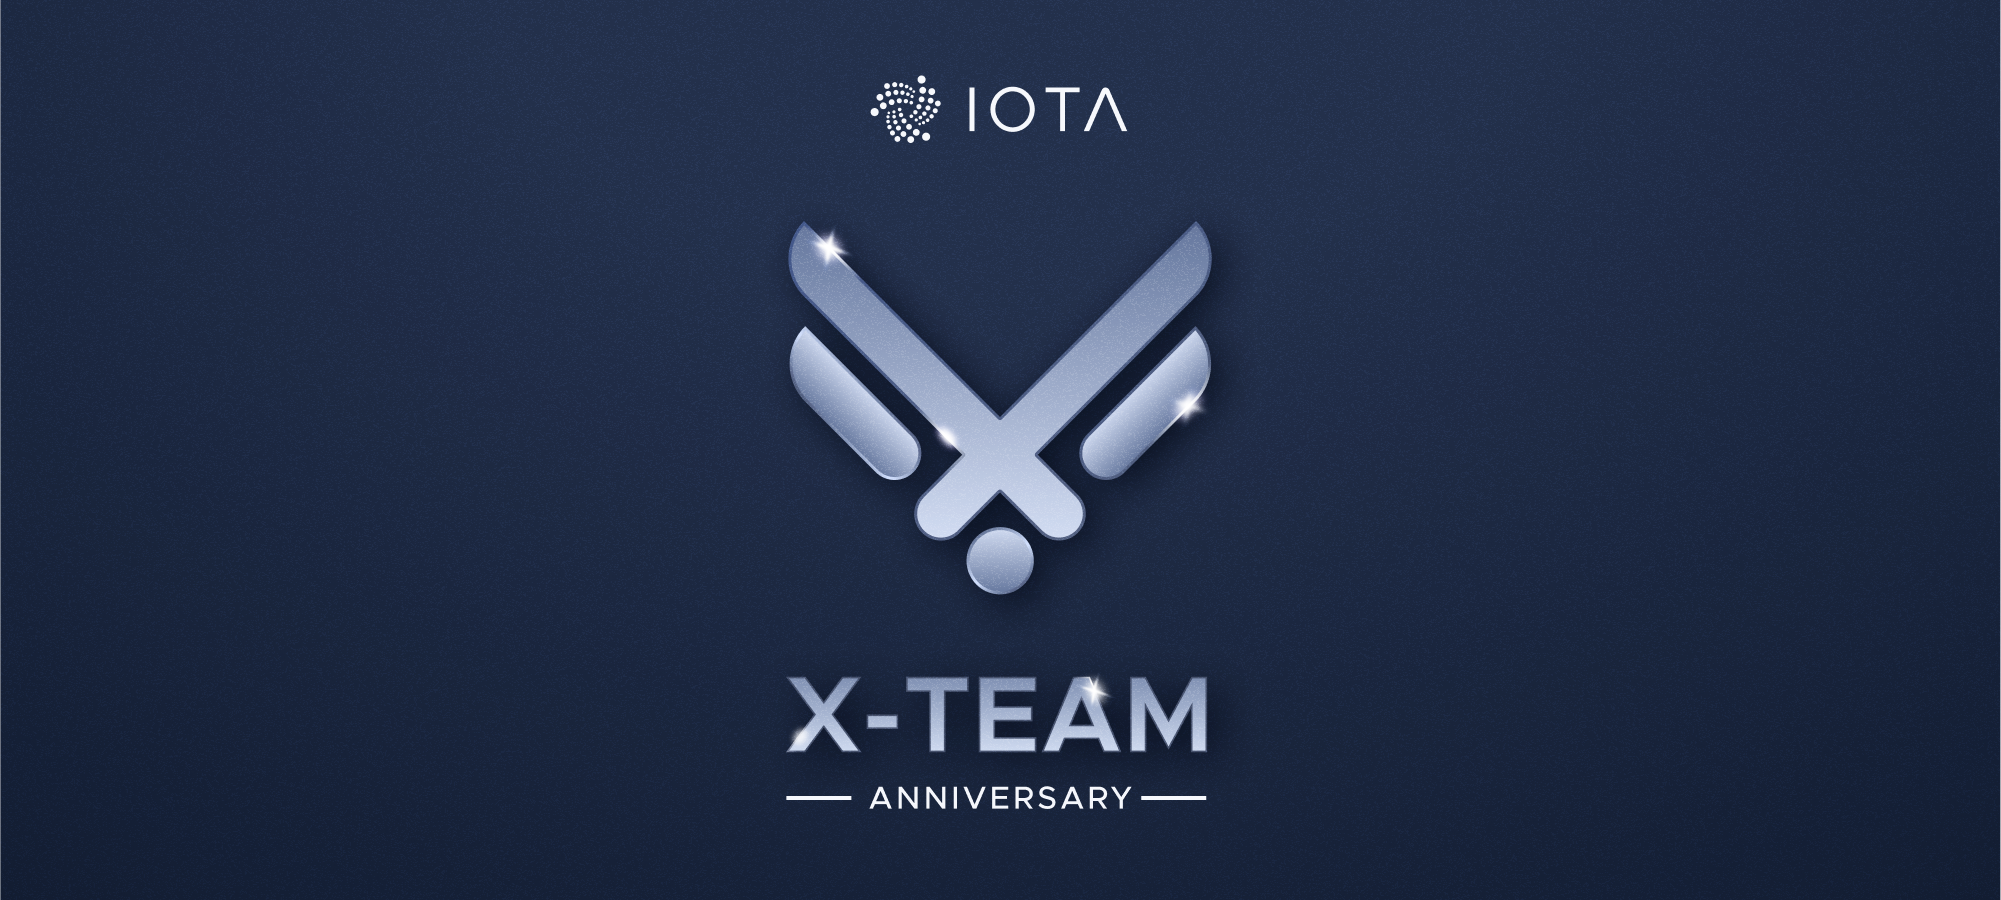 IOTA Experience Team - The first year recap